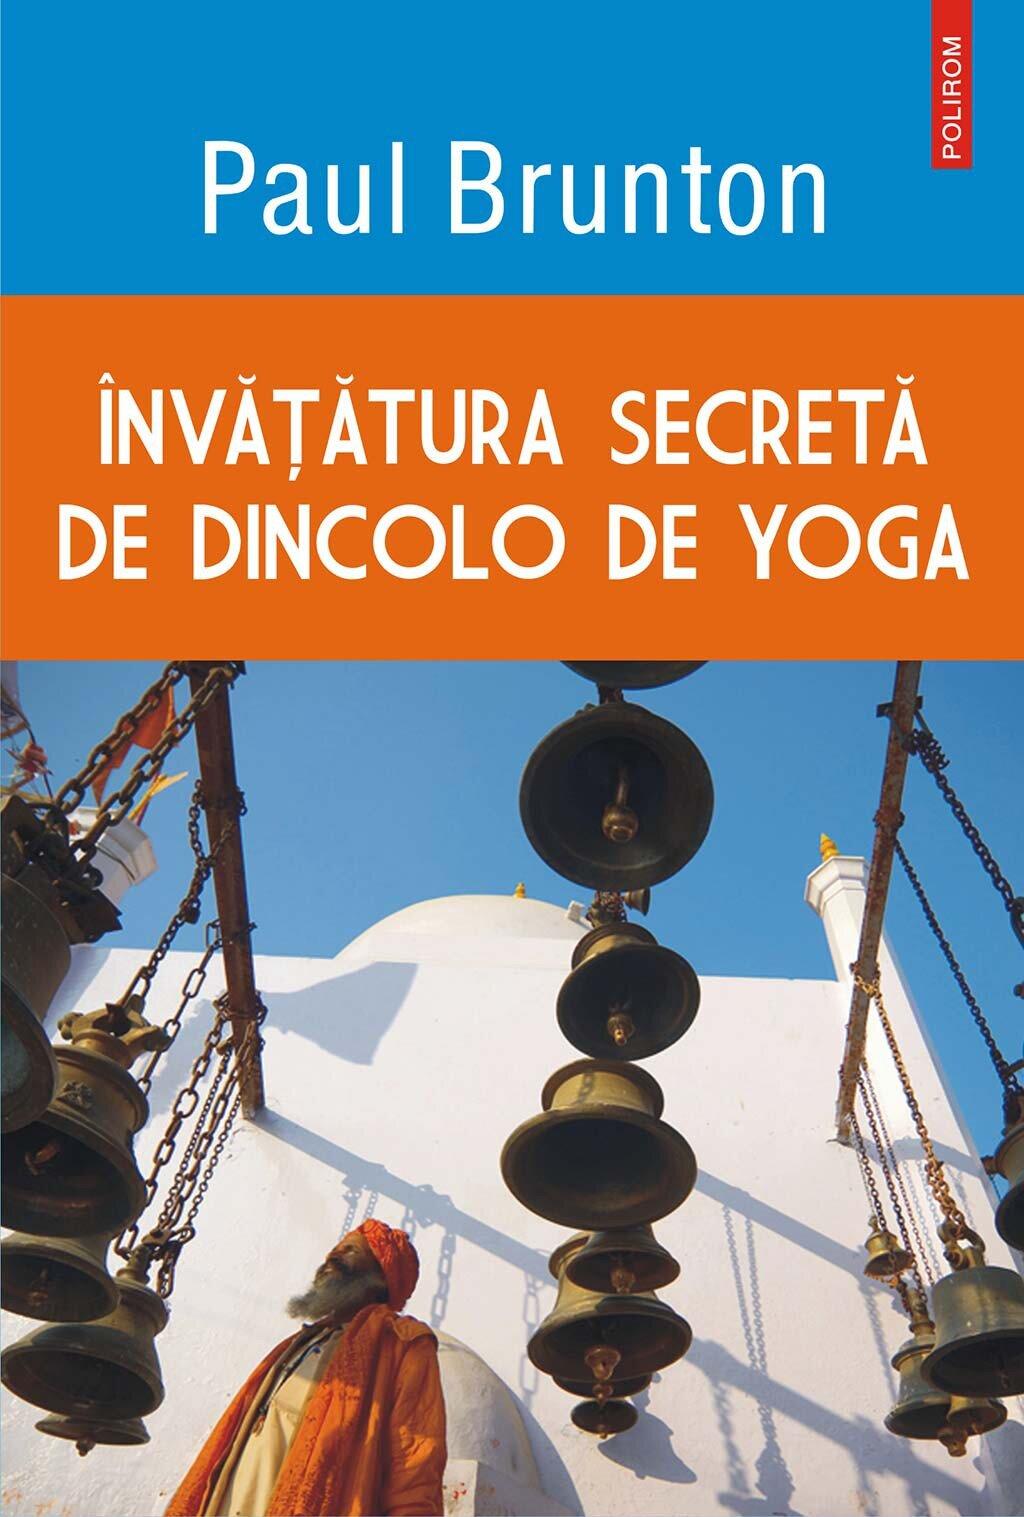 Invatatura secreta de dincolo de yoga (eBook)